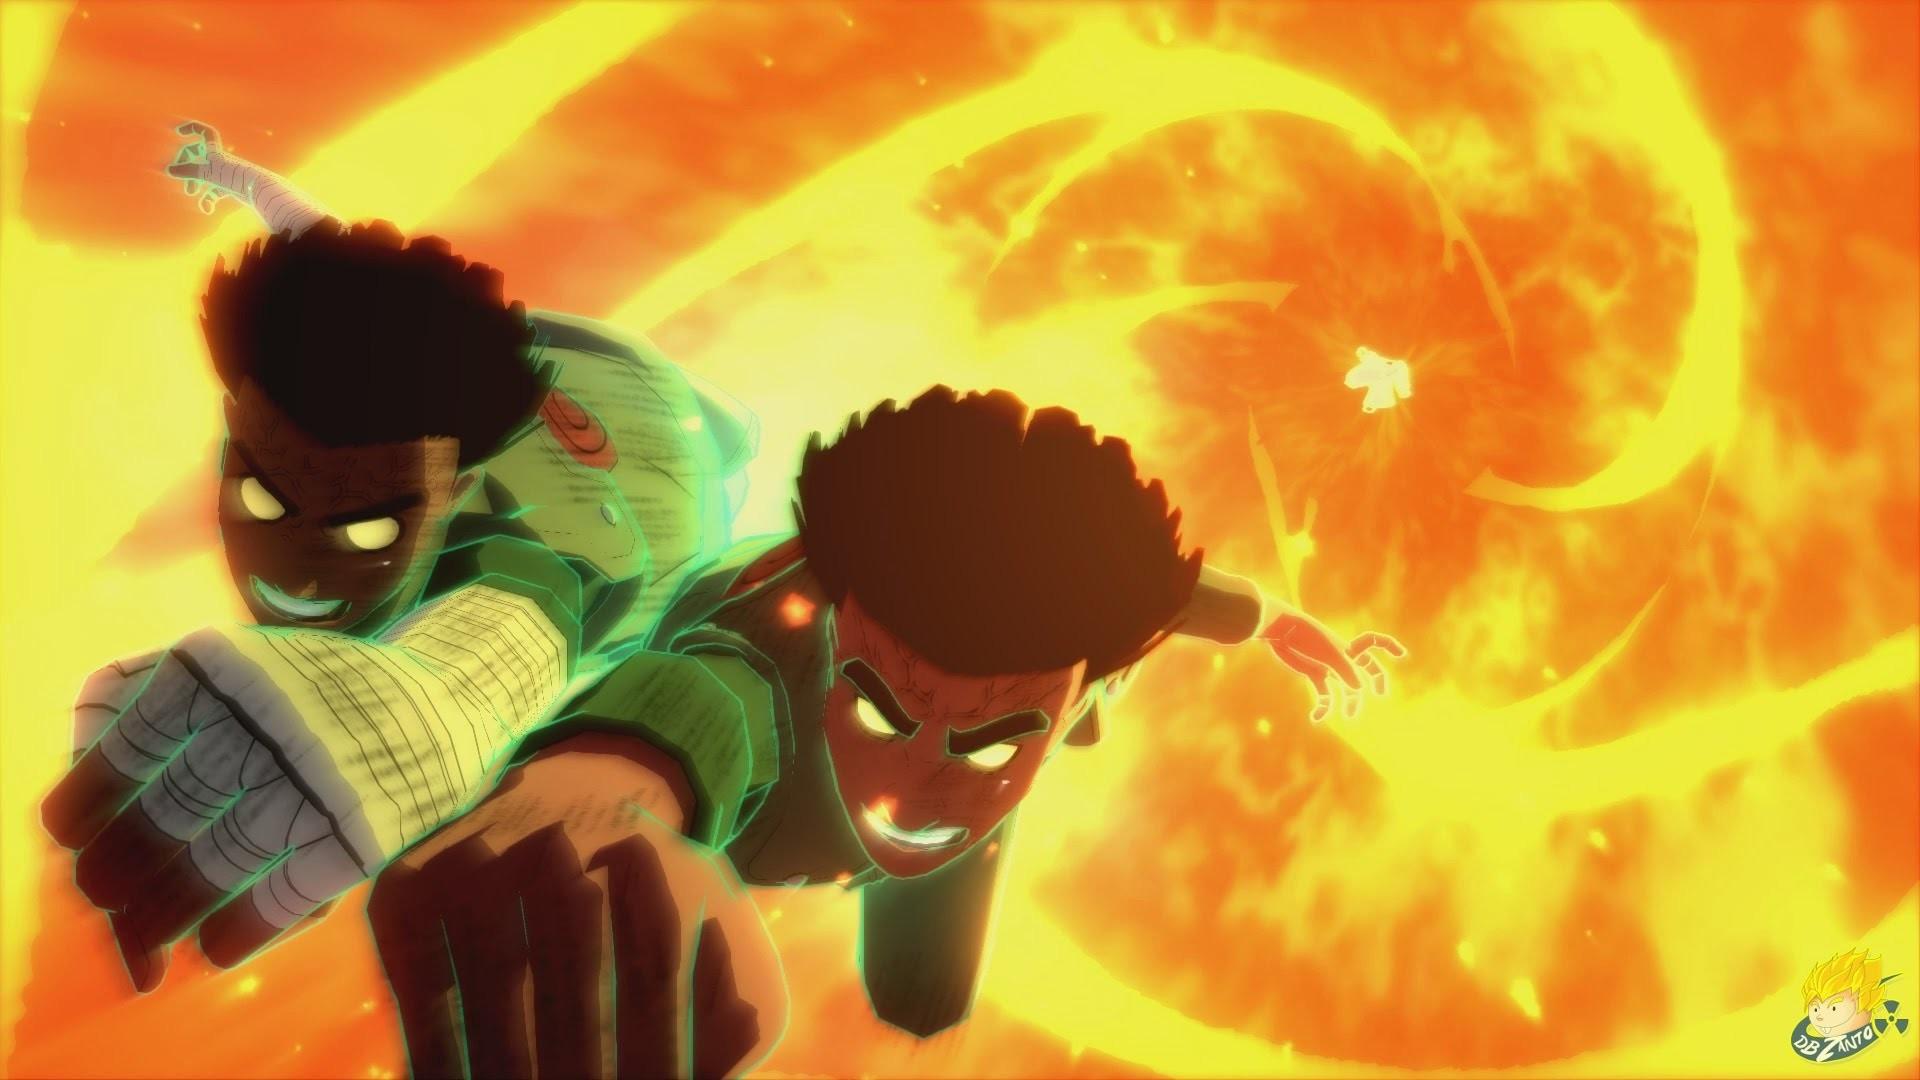 Naruto Shippuden: Ultimate Ninja Storm 4 – Rock Lee/Might Guy Team Ultimate  Jutsu【1080P】 – YouTube